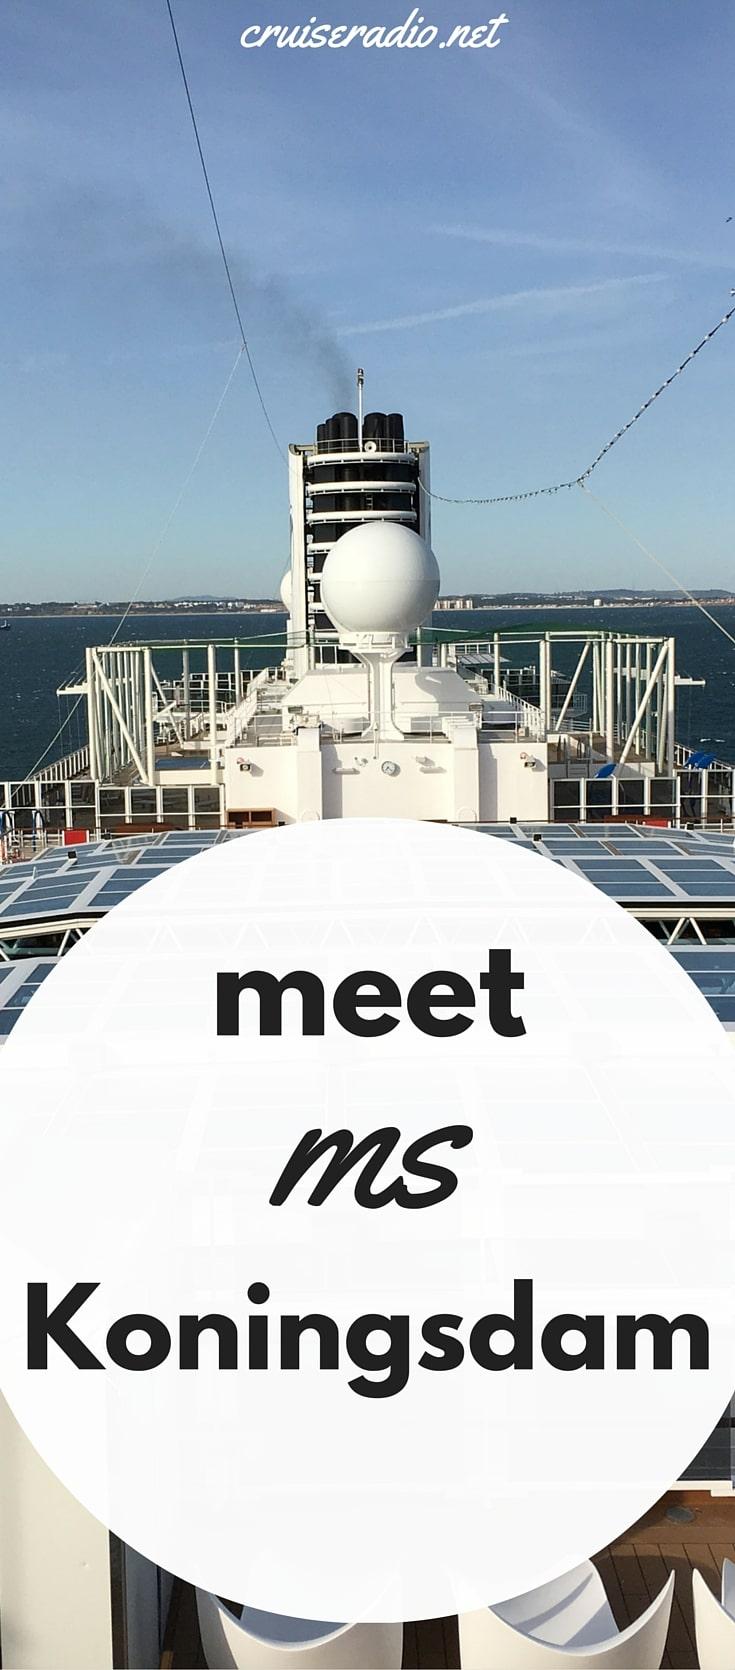 Koningsdam #hollandamerica #cruise #koningsdam #travel #vacation